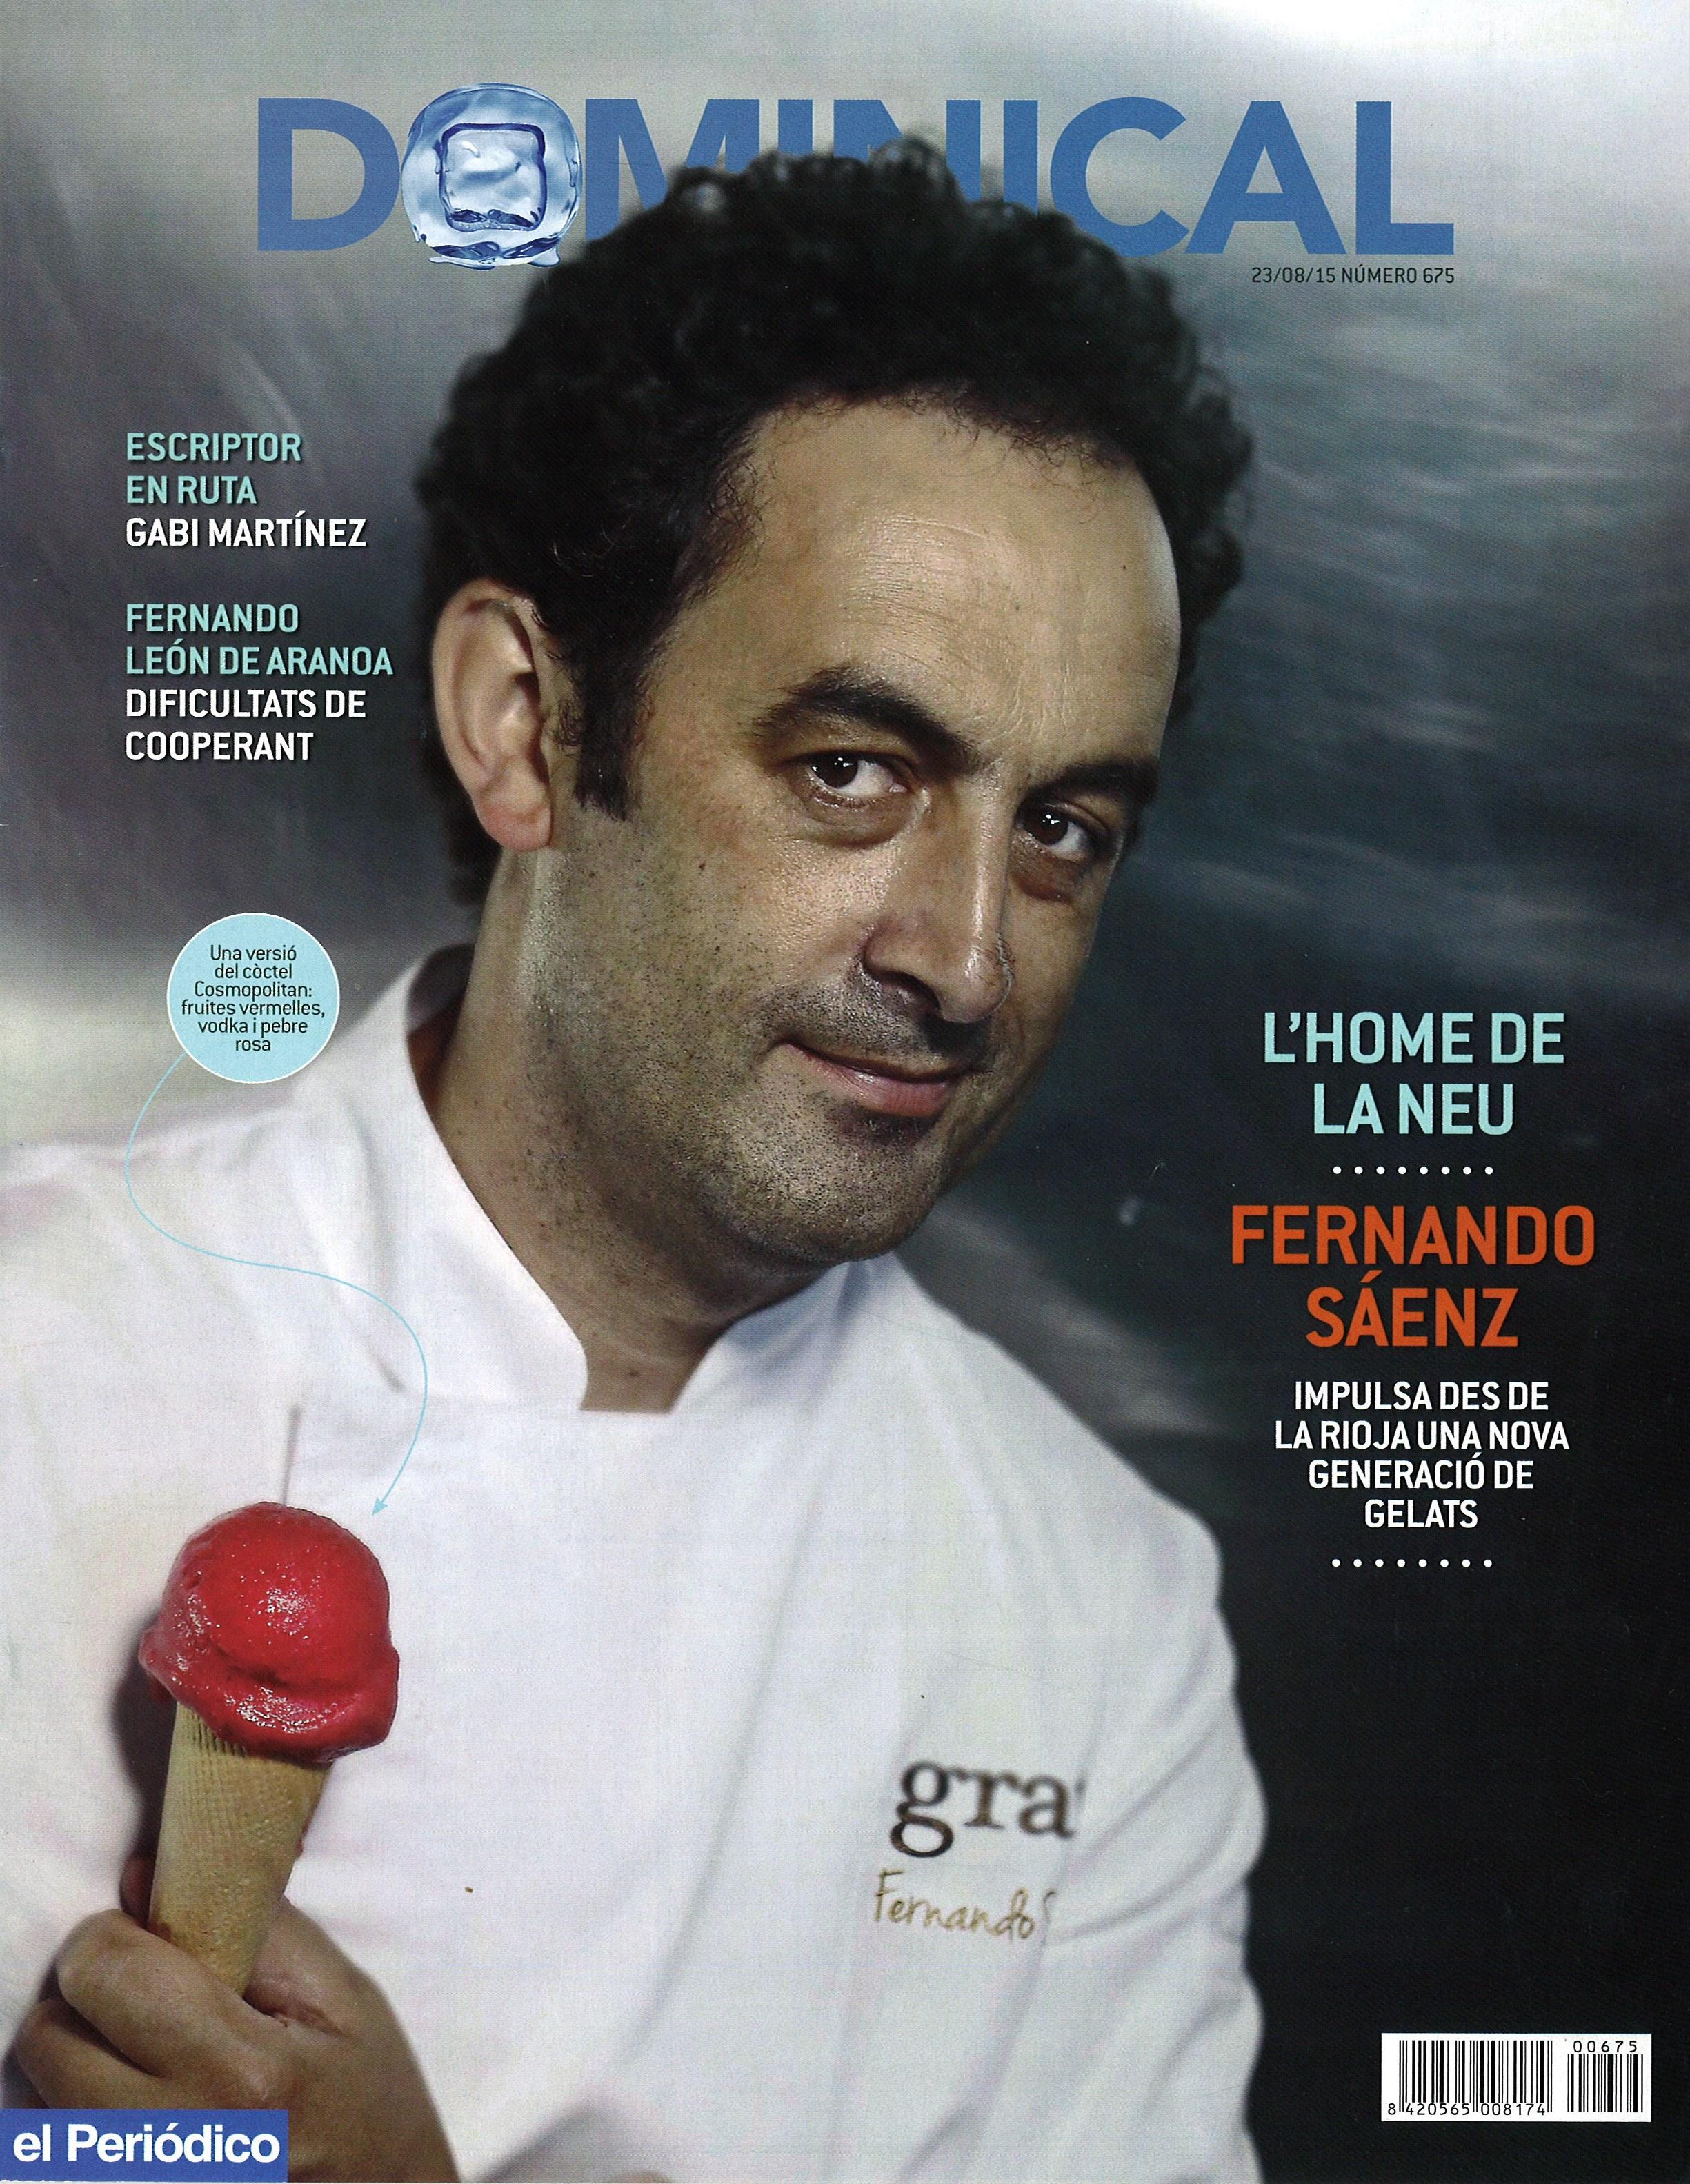 portada_El_Periodico_DOMINICAL_ 23.08.15_CAT_ la_torre_4